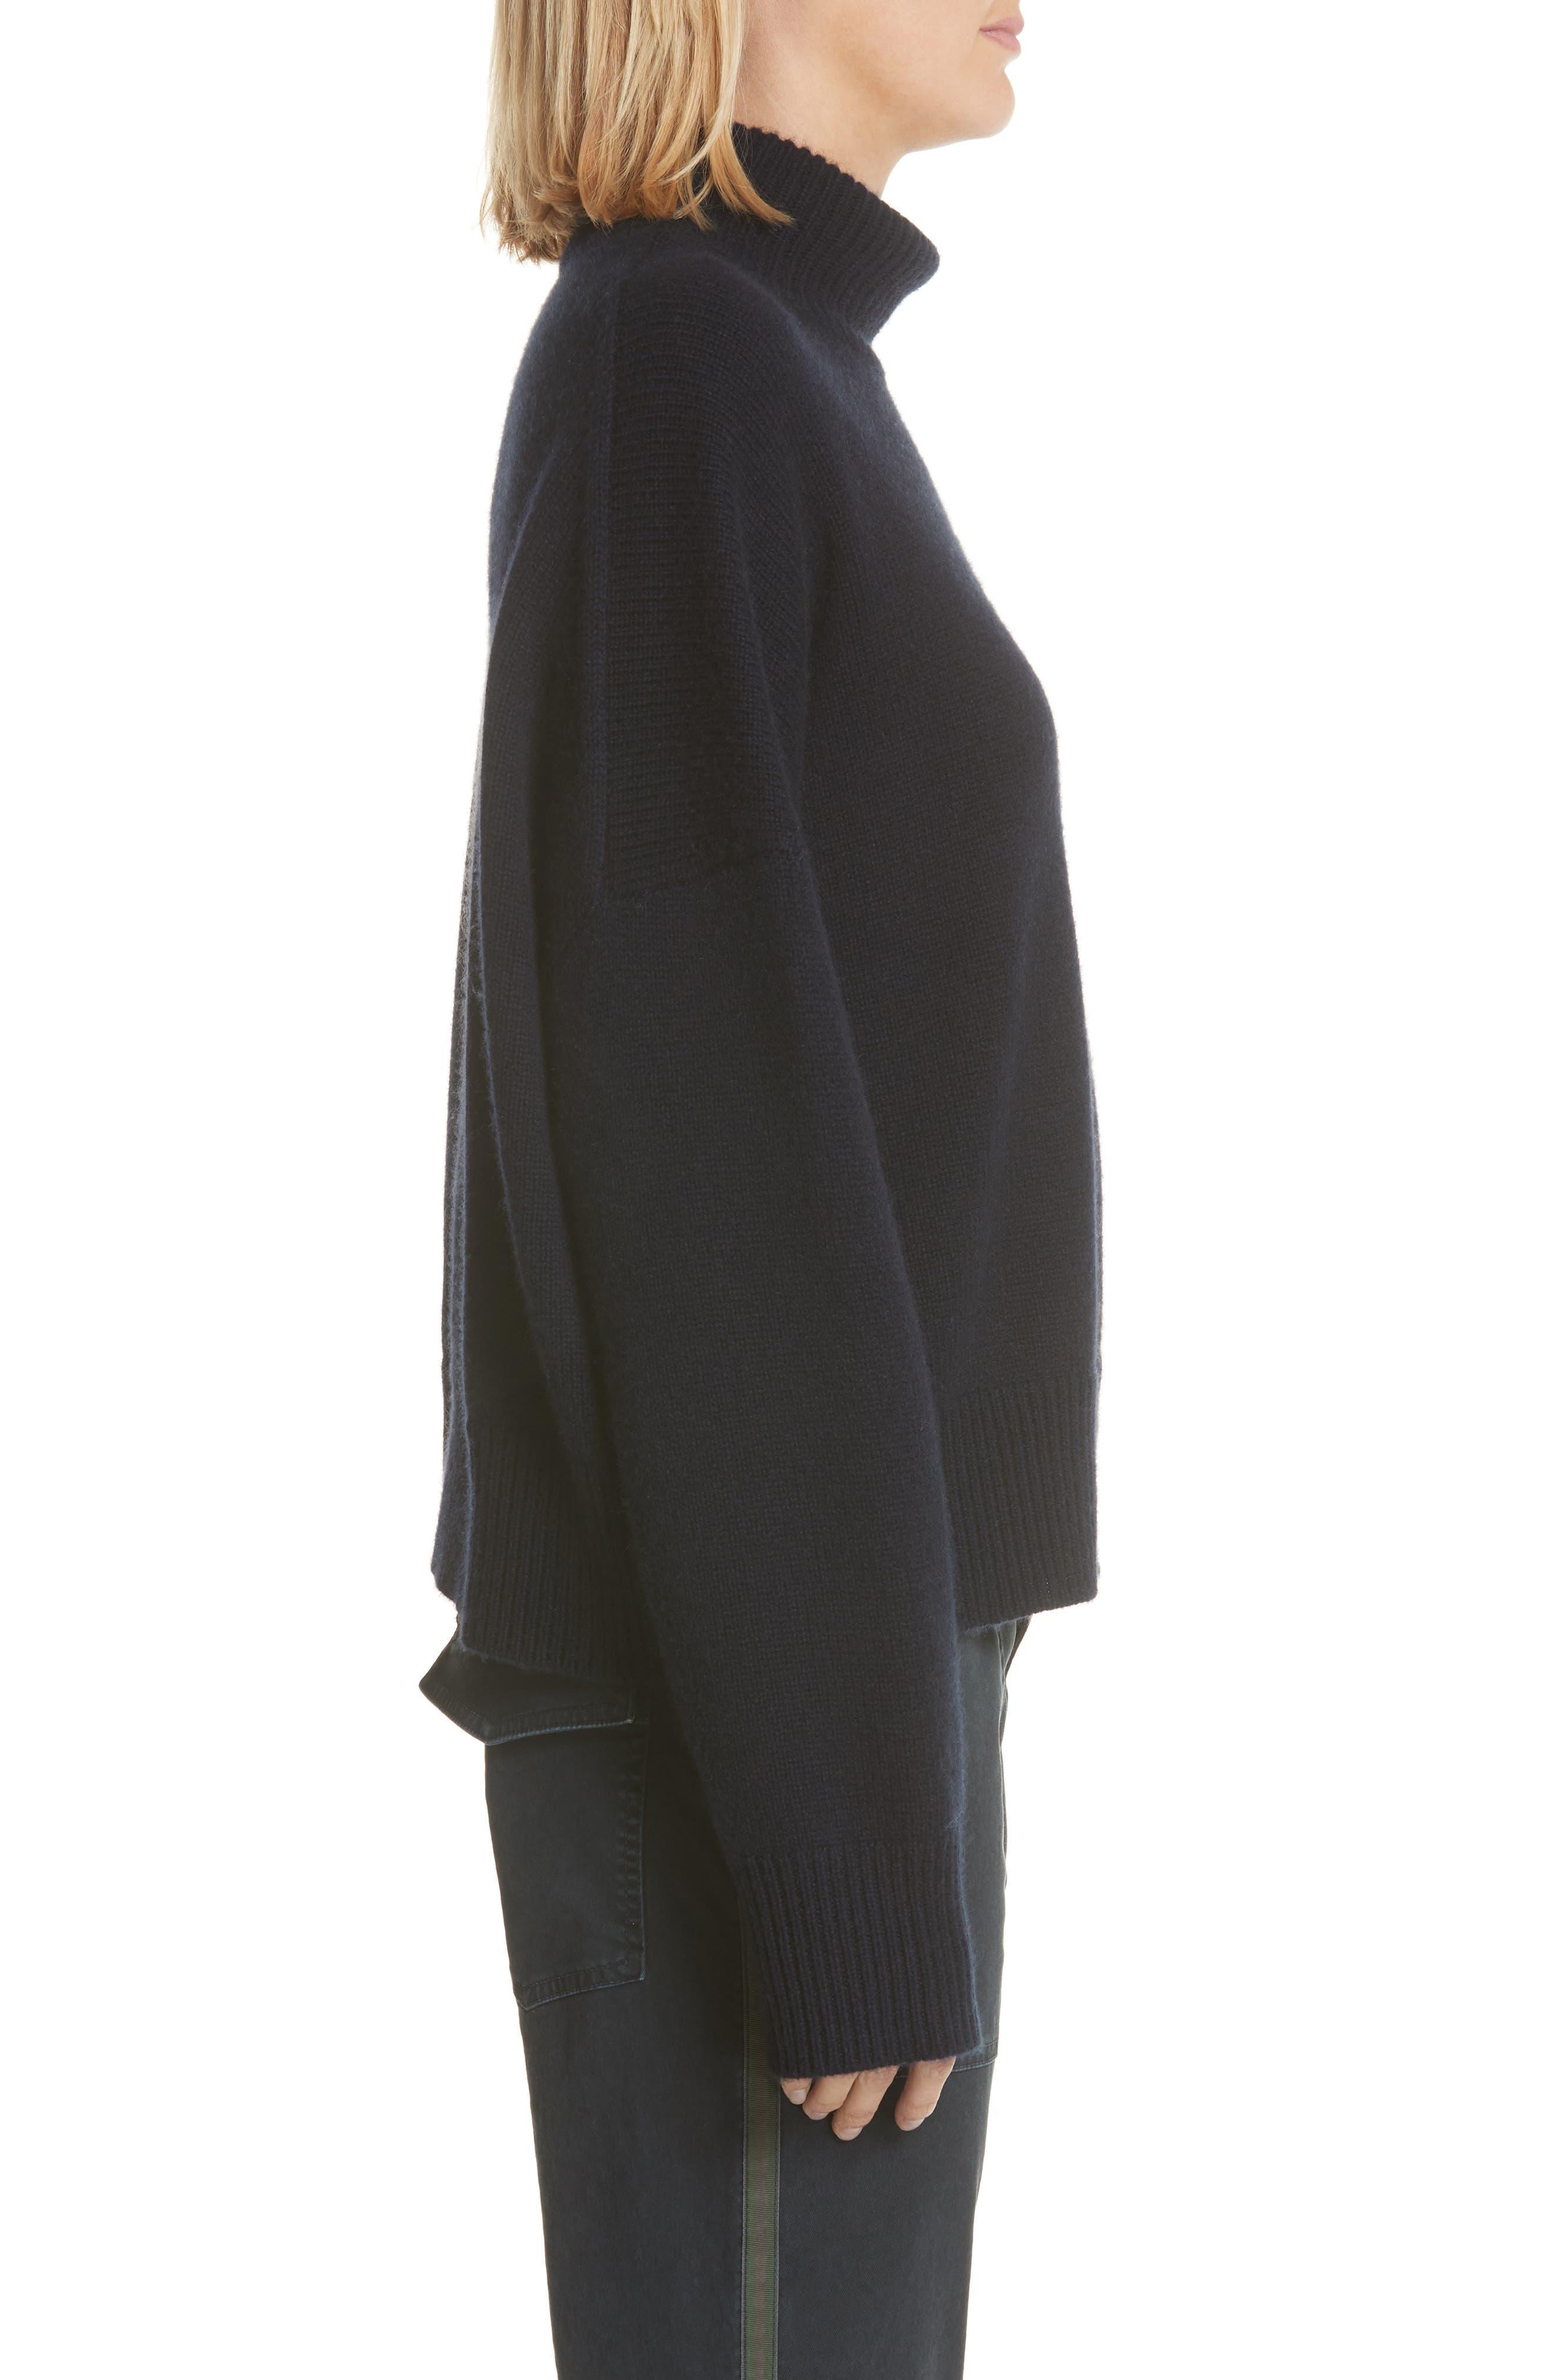 Serinda Wool & Cashmere Turtleneck Sweater,                             Alternate thumbnail 3, color,                             Dark Navy